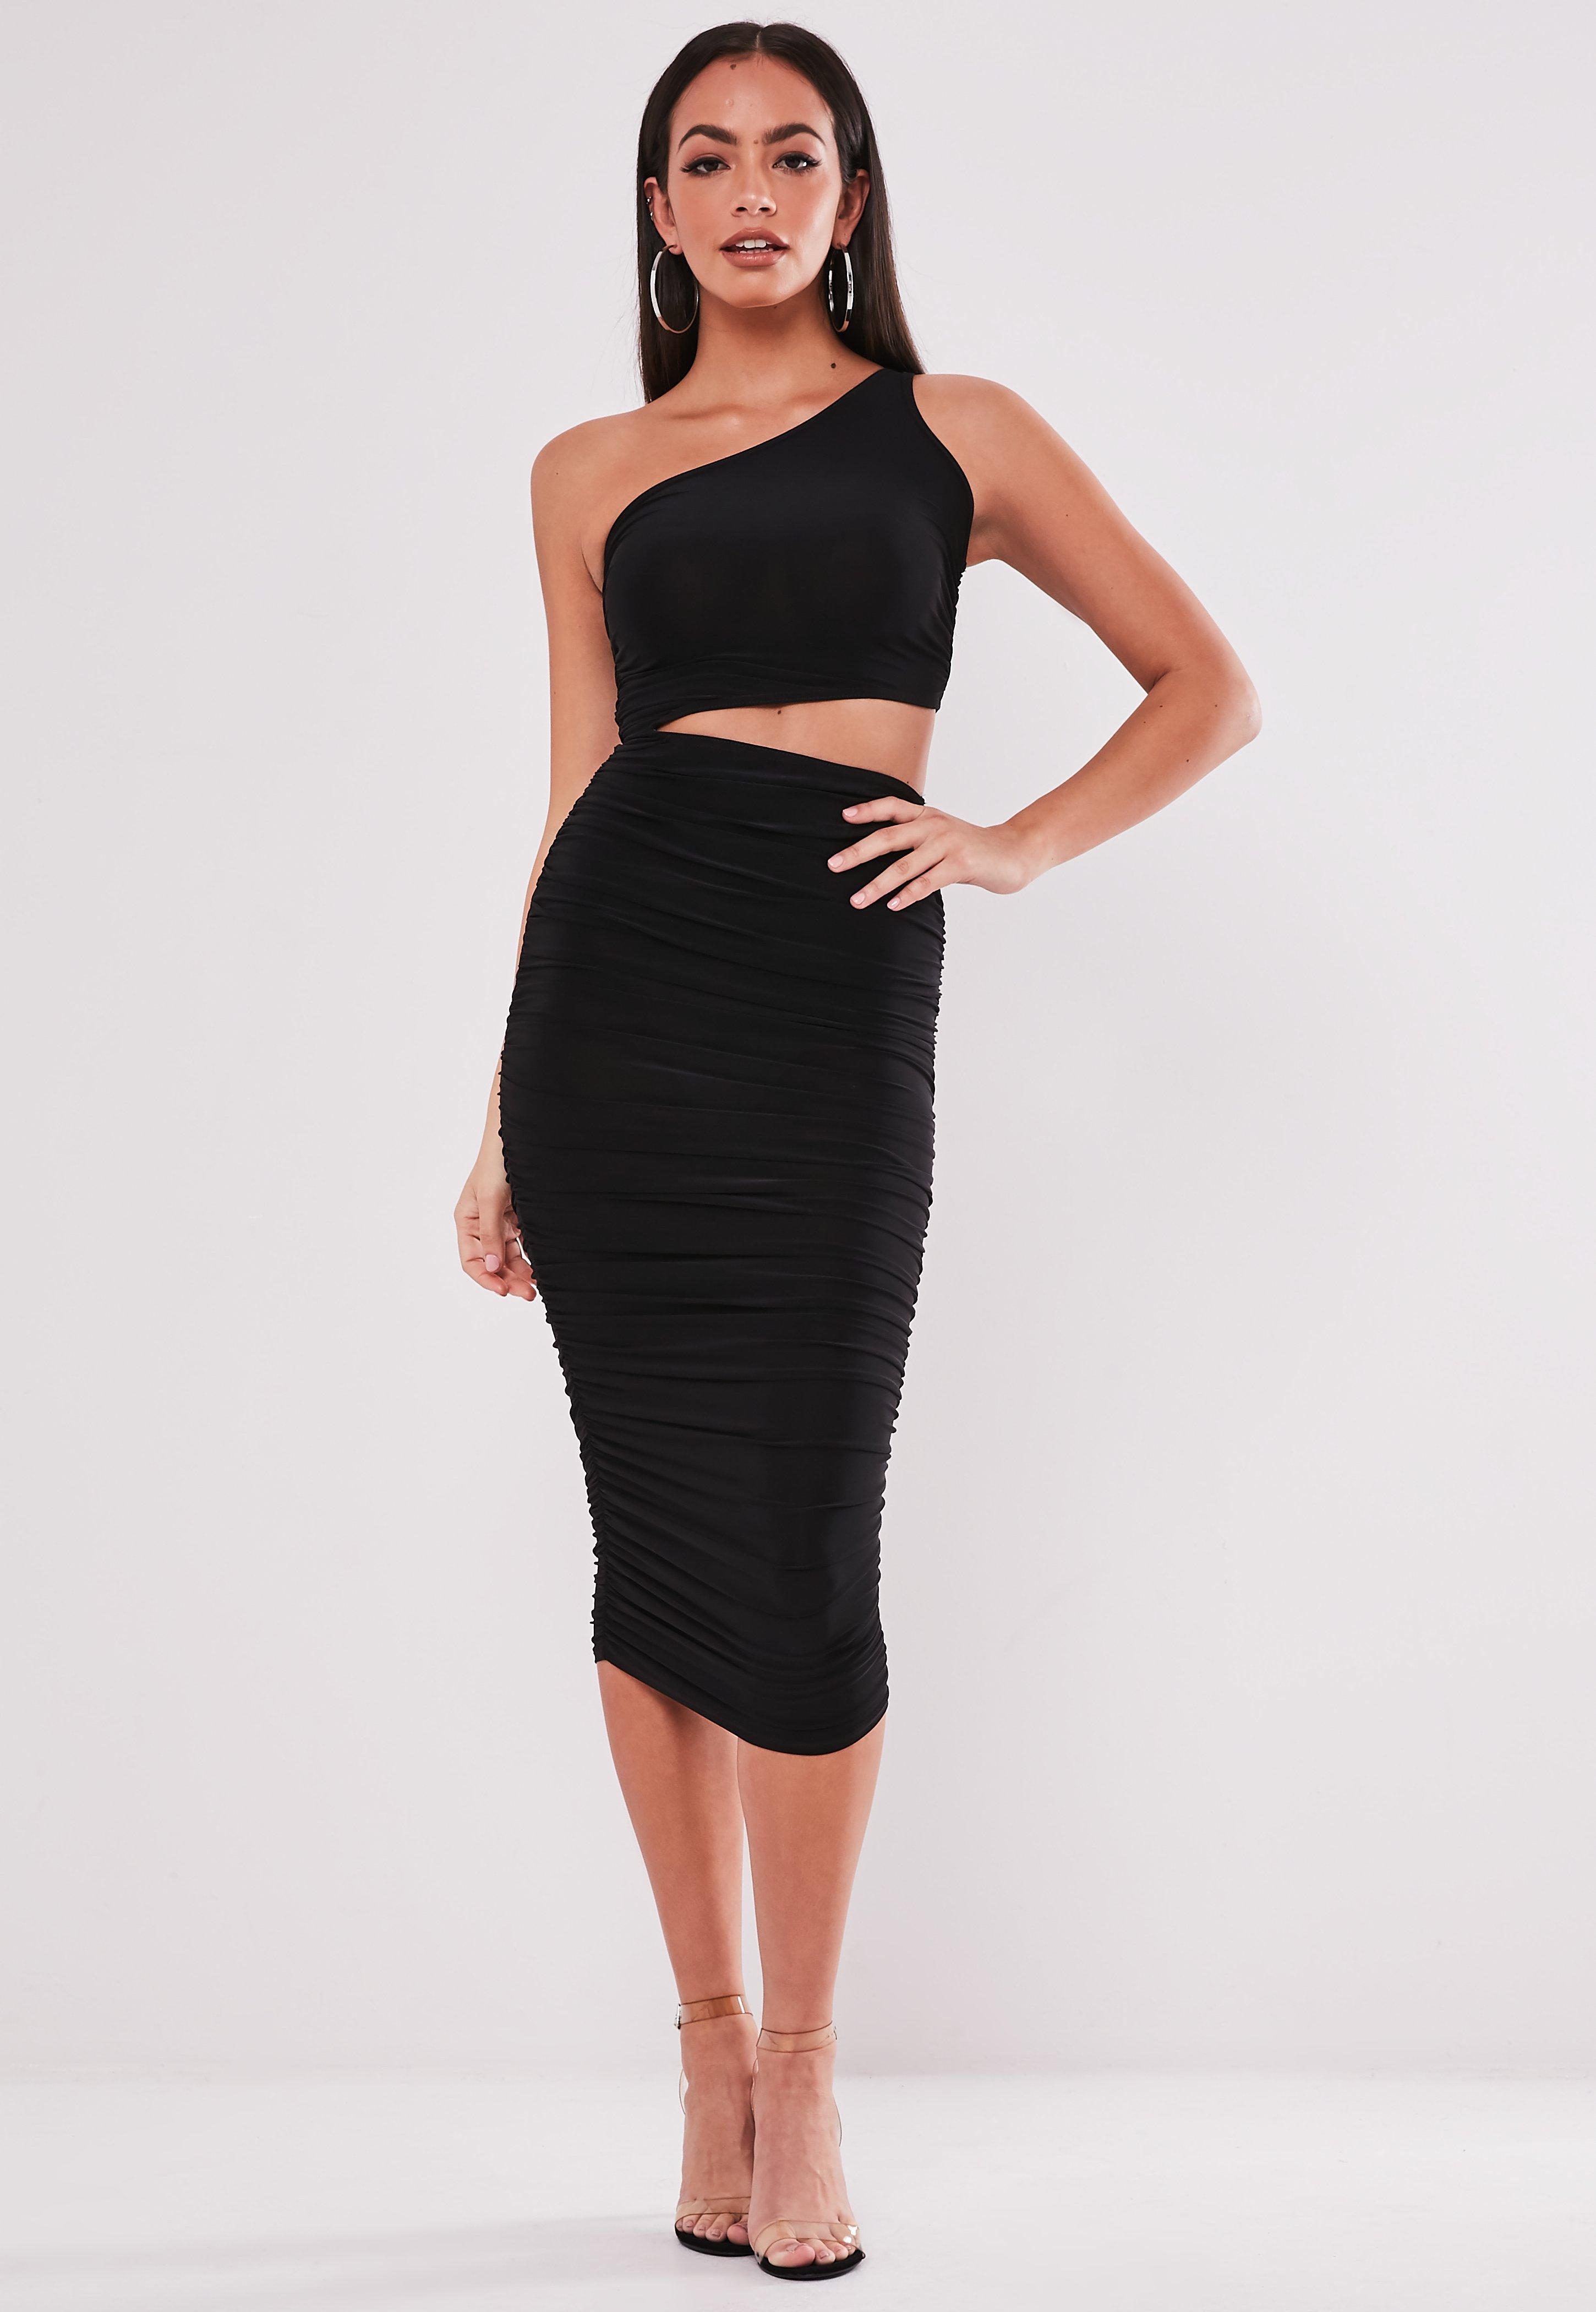 Black Slinky One Shoulder Cut Out Midi Dress